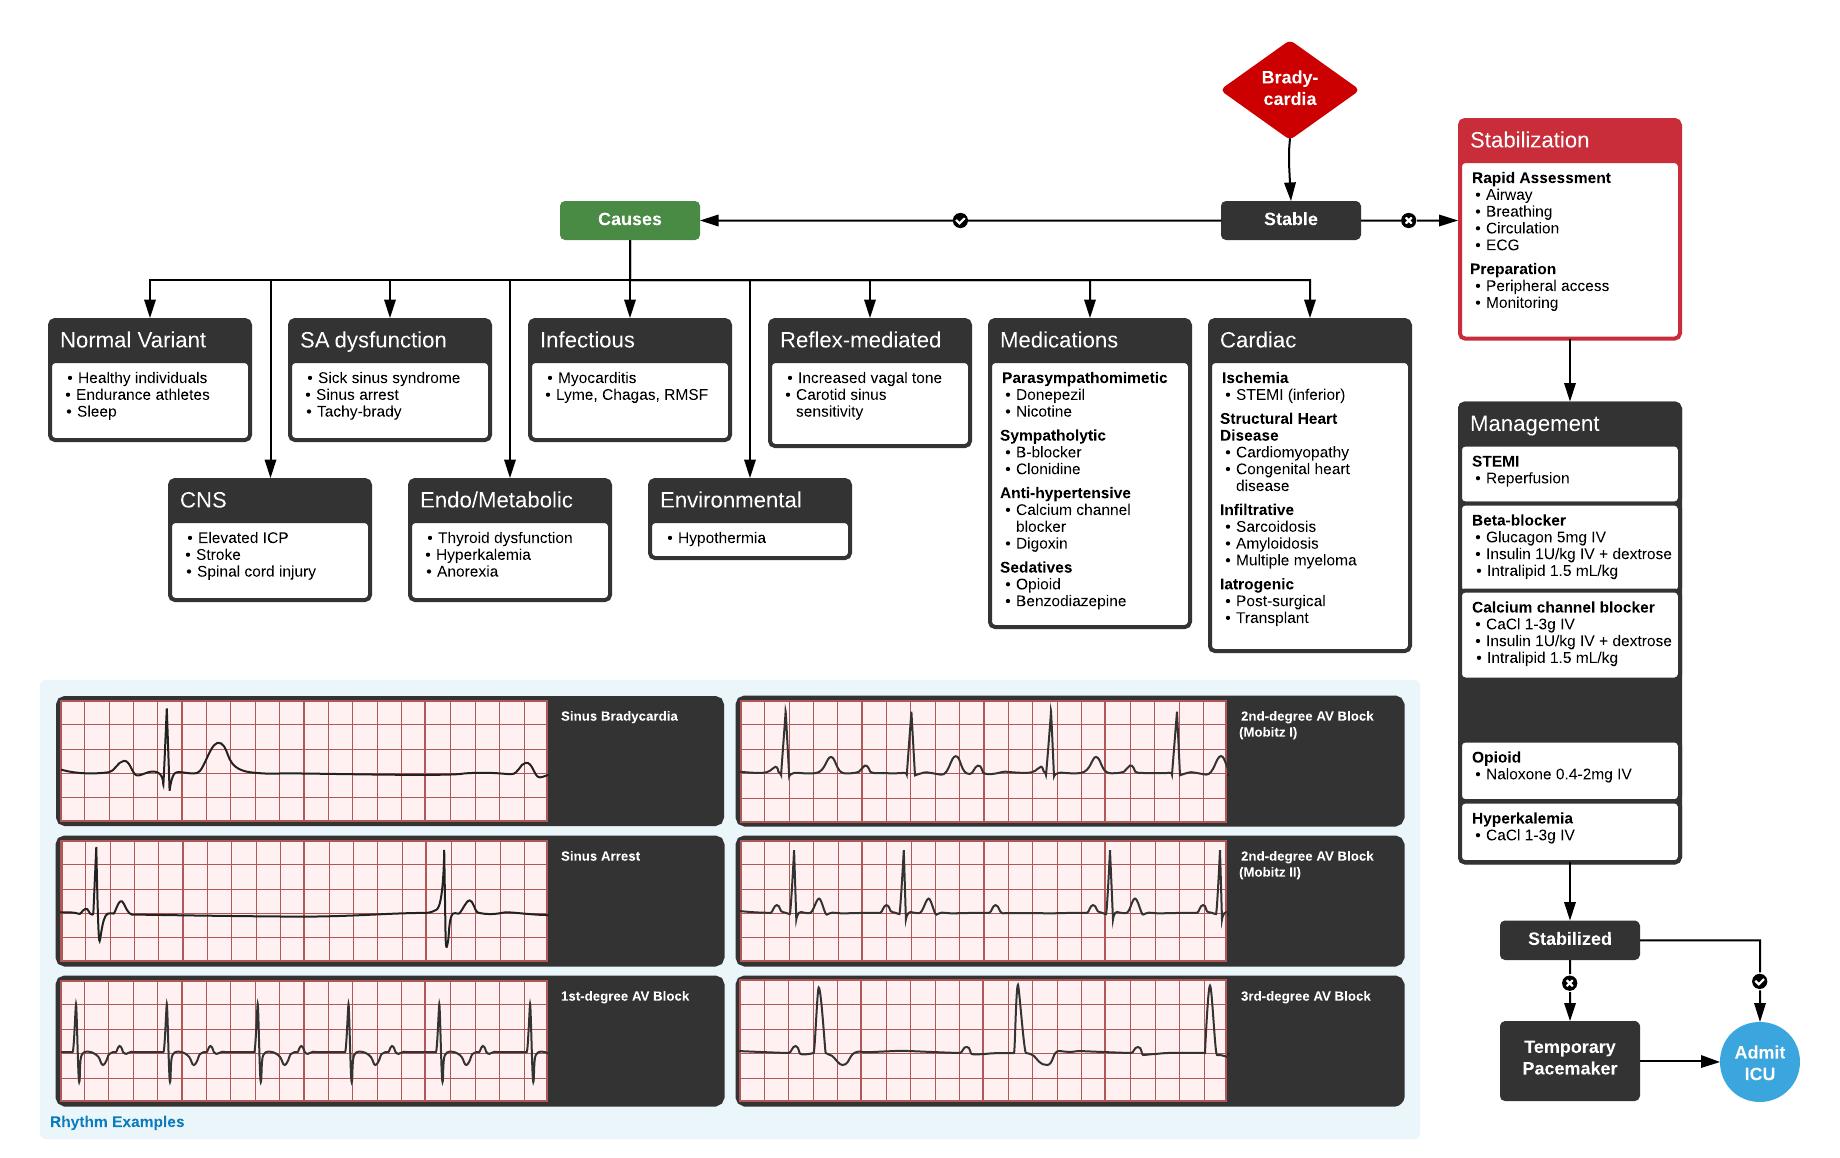 Full ddxof.com article and algorithm on Bradycardia can be found at  https://ddxof.com/?_sf_s=bradycardia